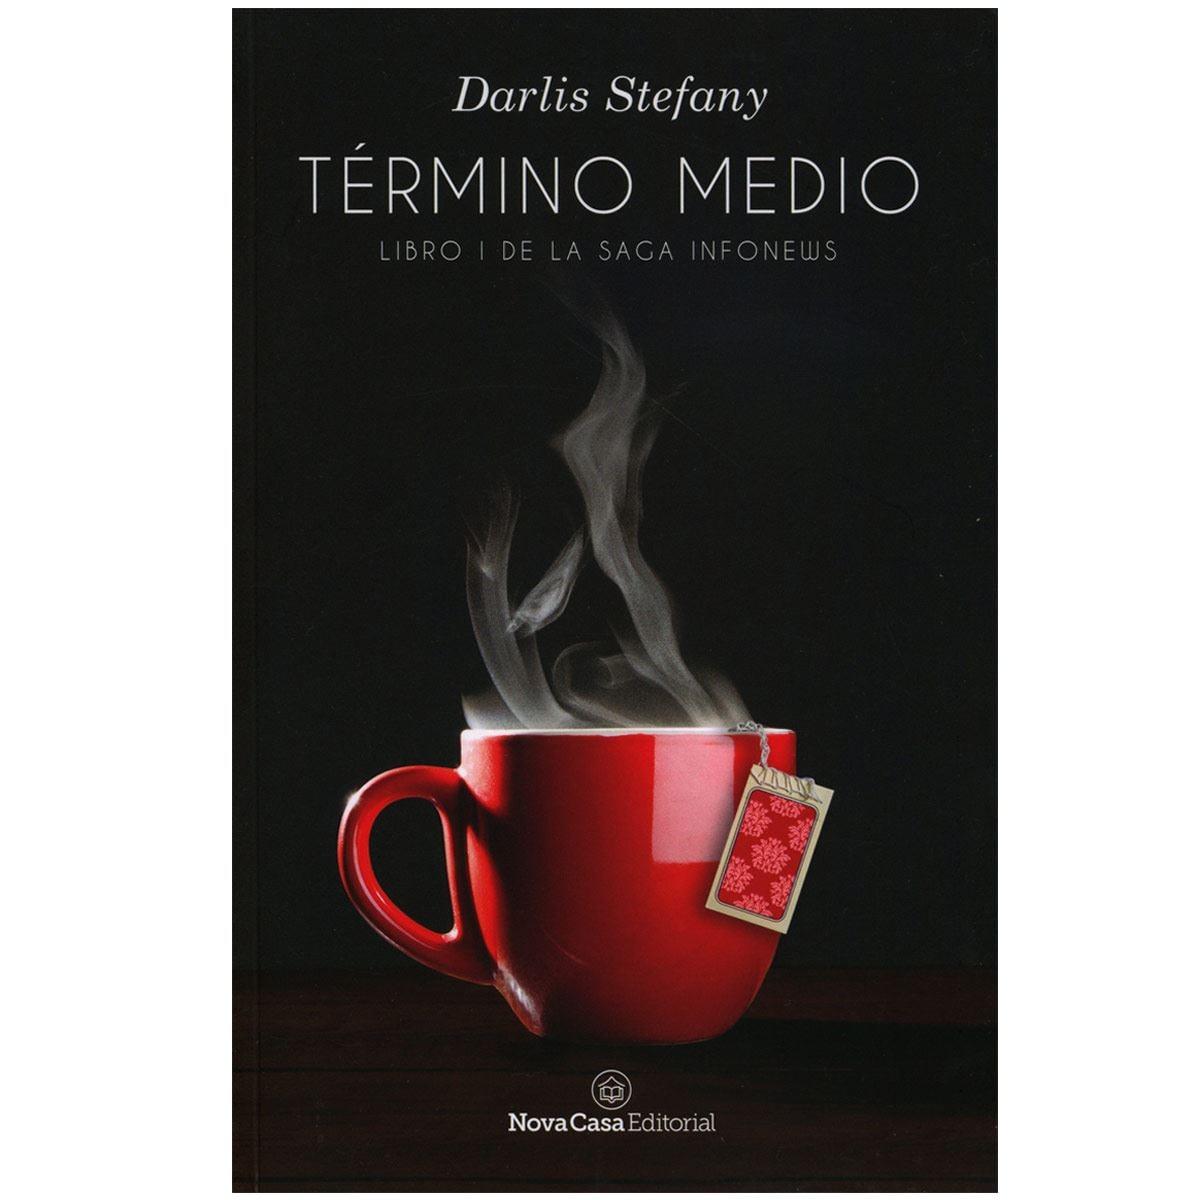 Término medio. Libro 1